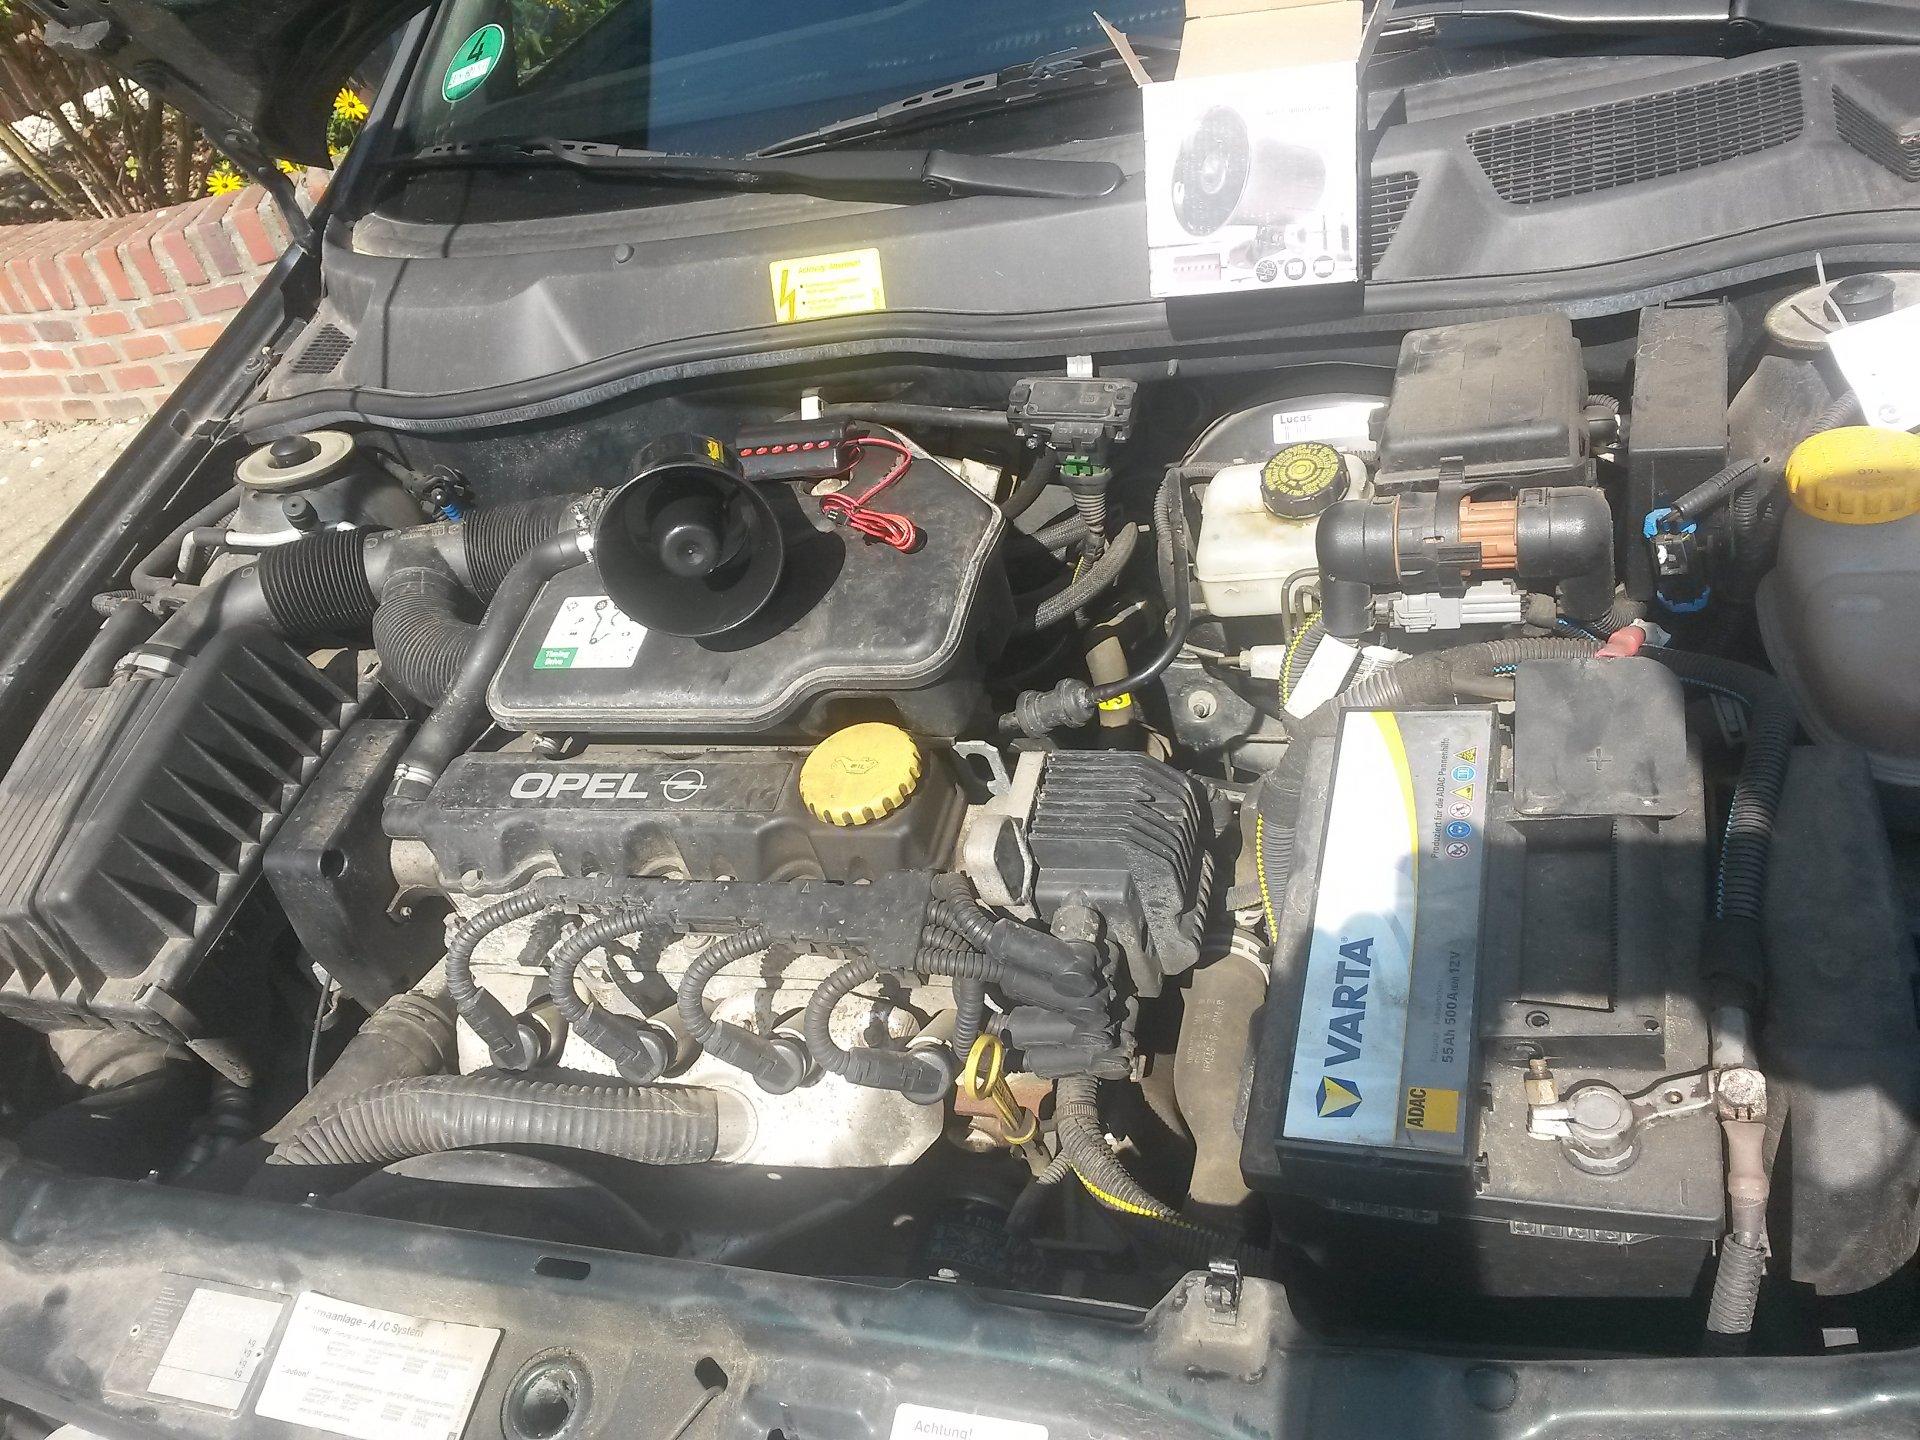 12V Auto-Sirene in Opel Astra G einbauen_02.jpg